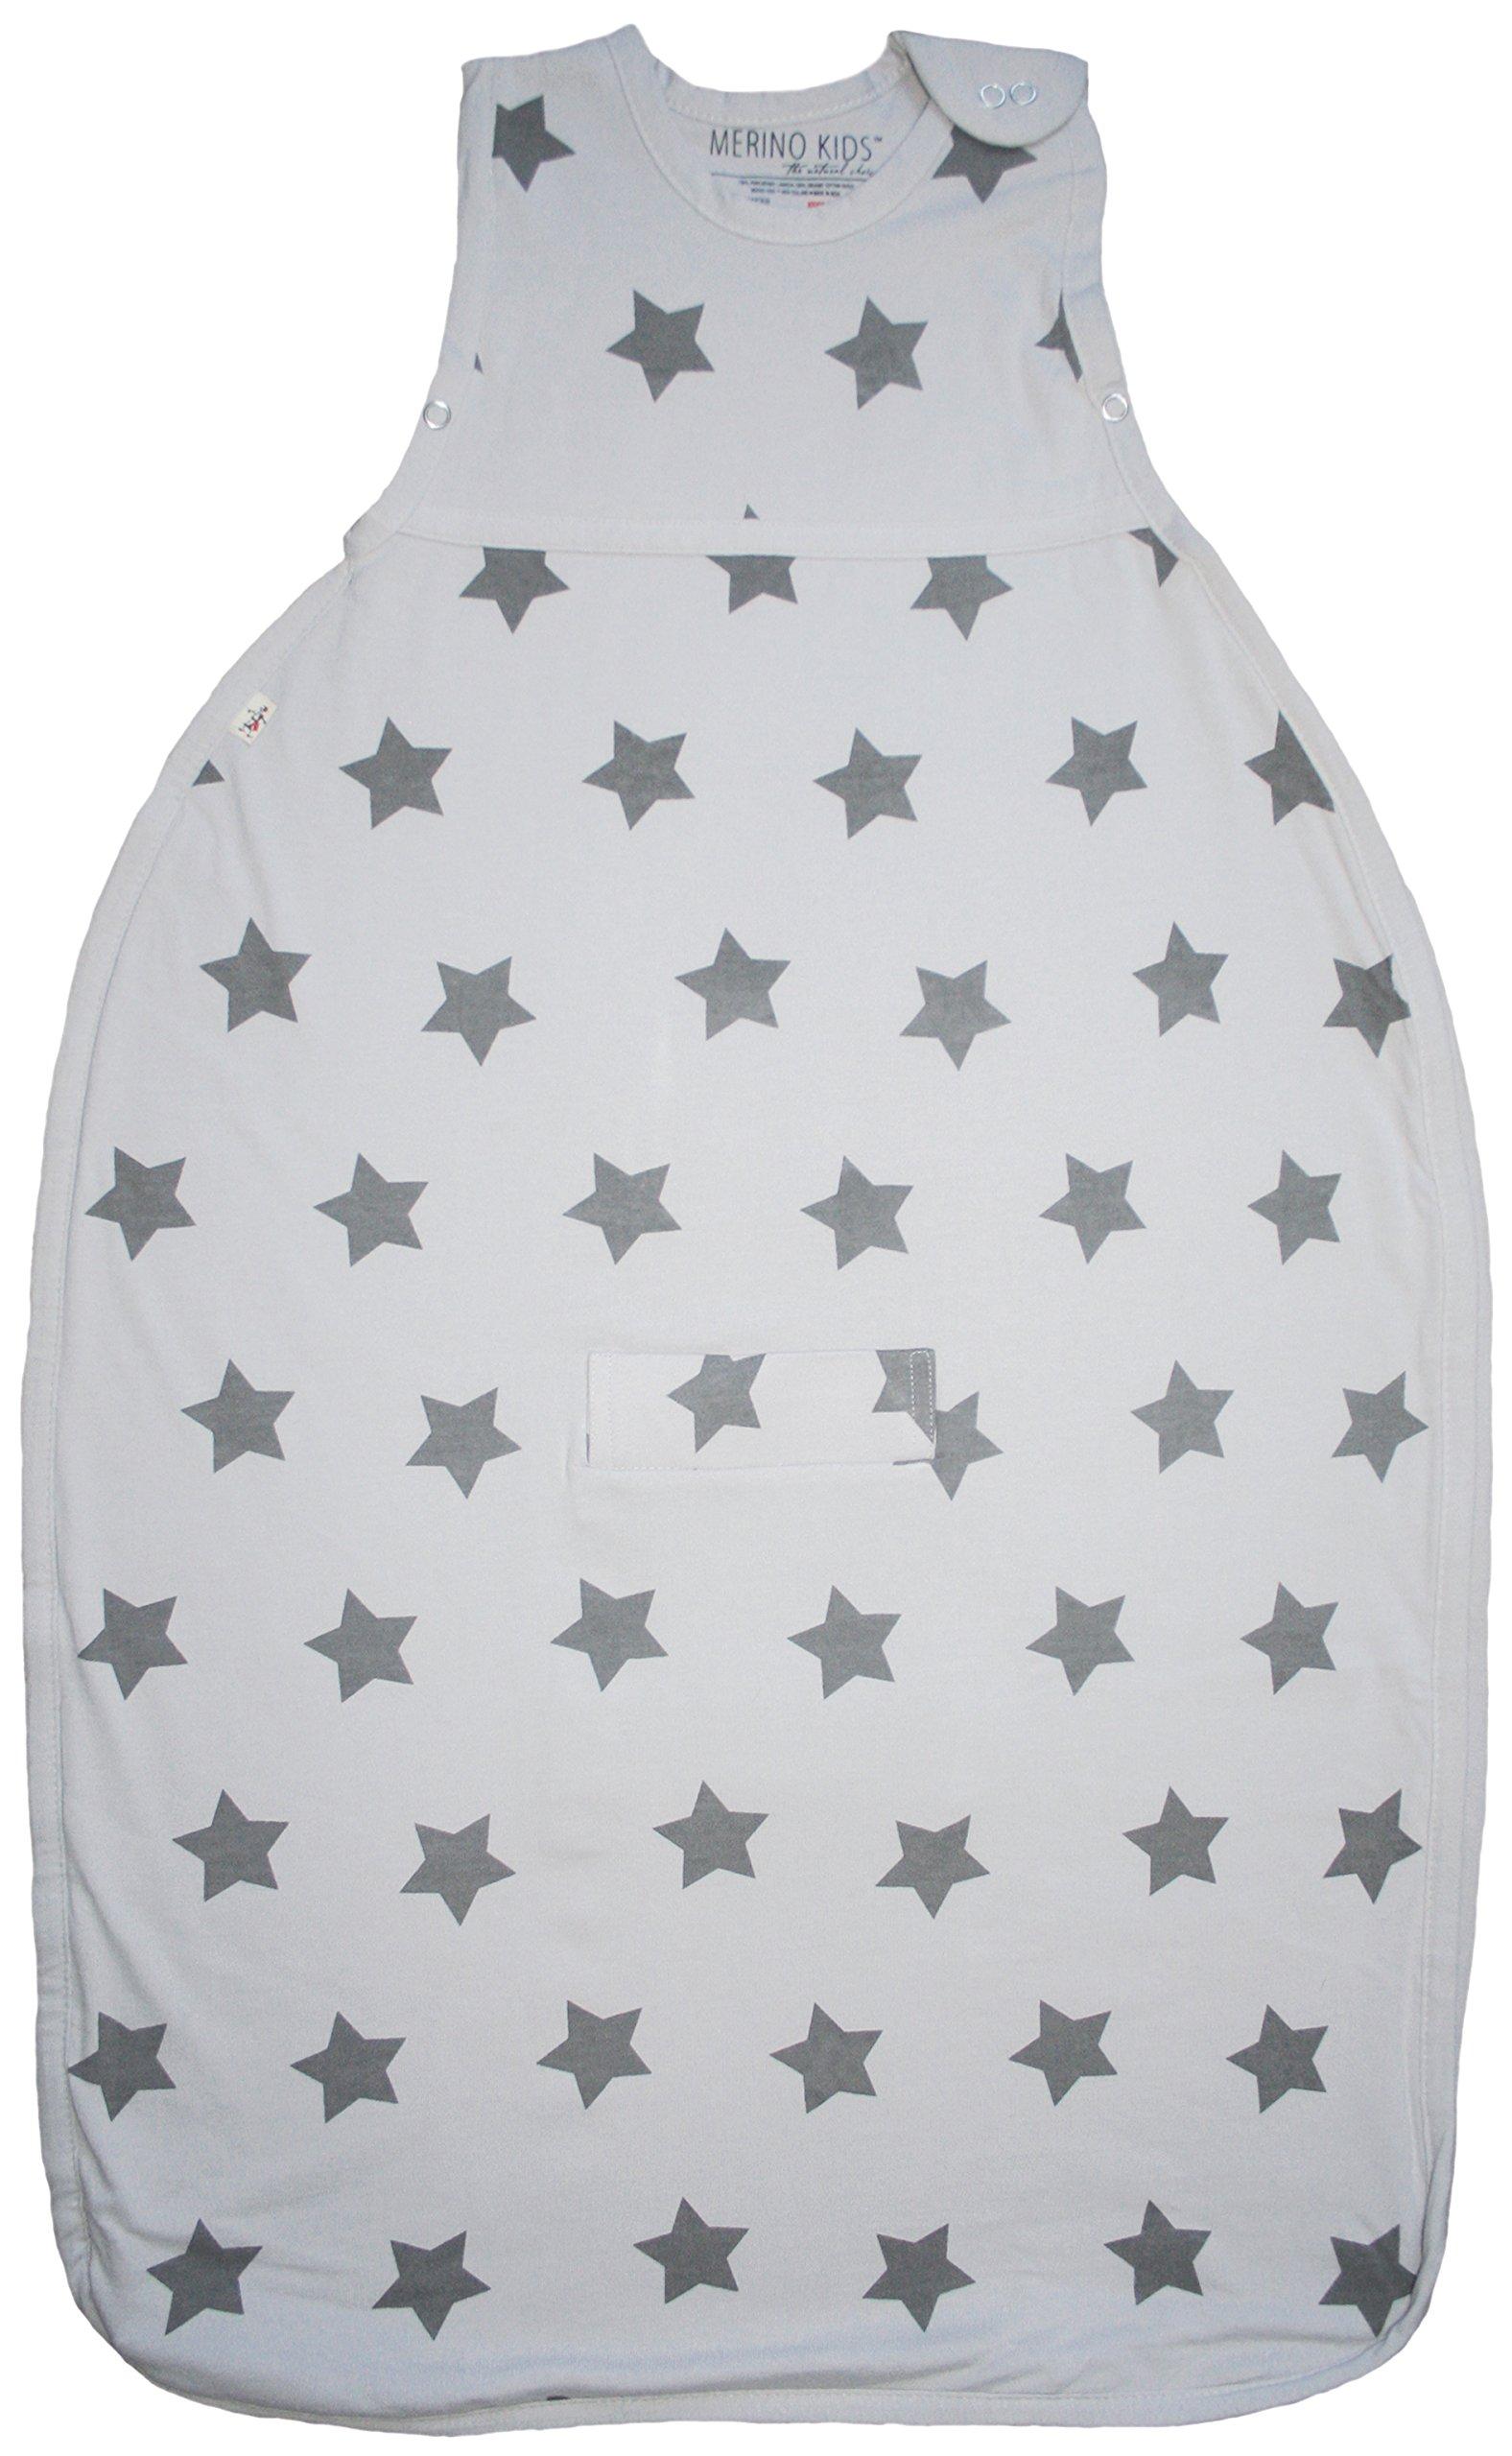 Merino Kids Starry Nights Baby Sleep Bag For Toddlers 2-4 Years, Moon Rock